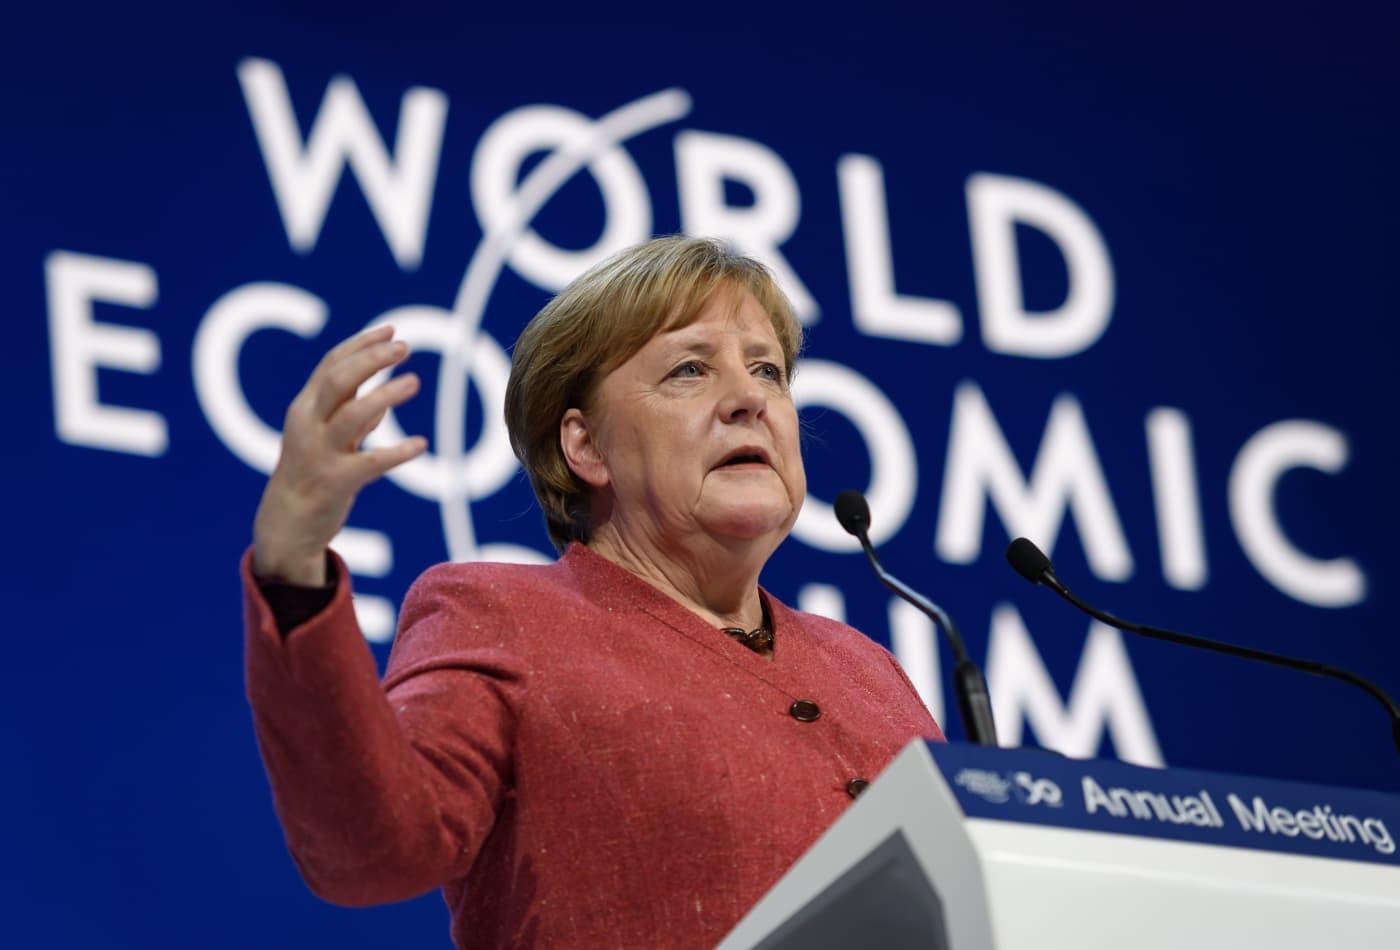 Libya could be the new Syria, Merkel warns